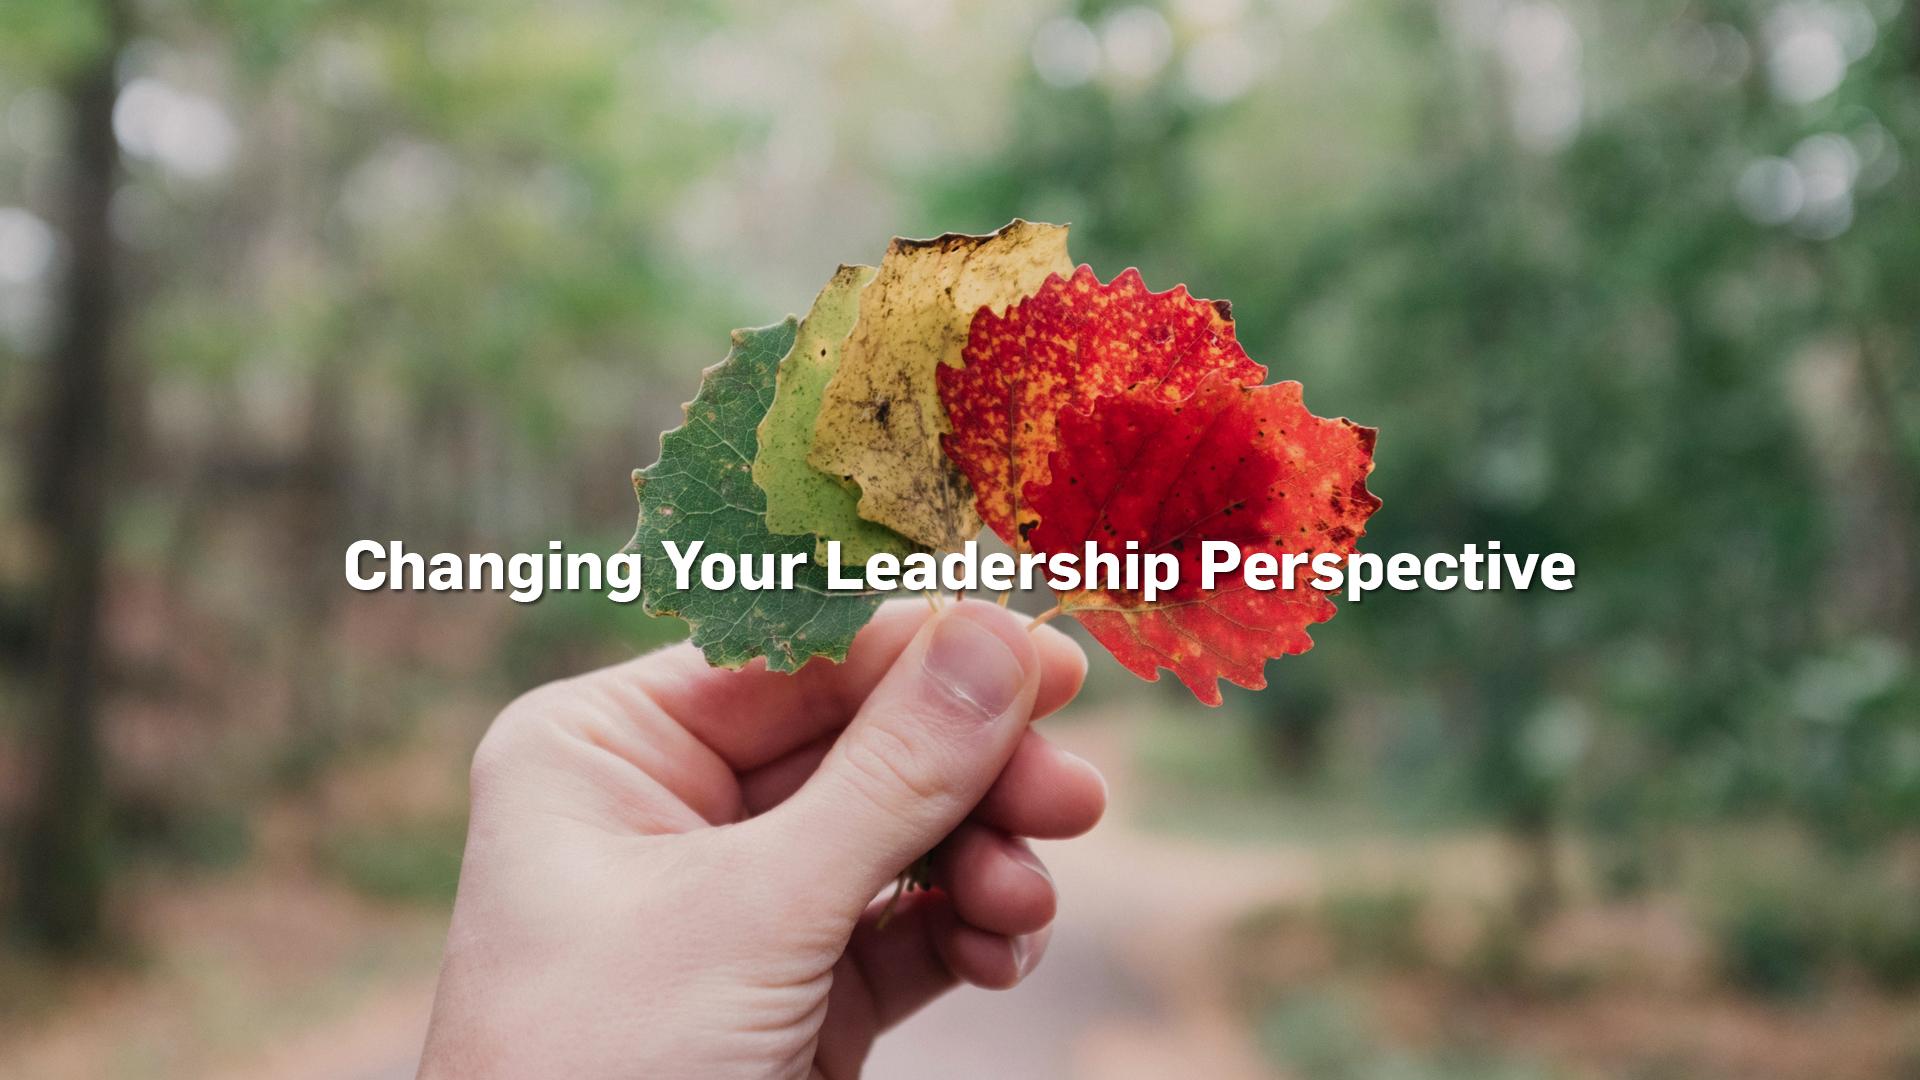 Changing leadership perspective 1920x1080.jpg